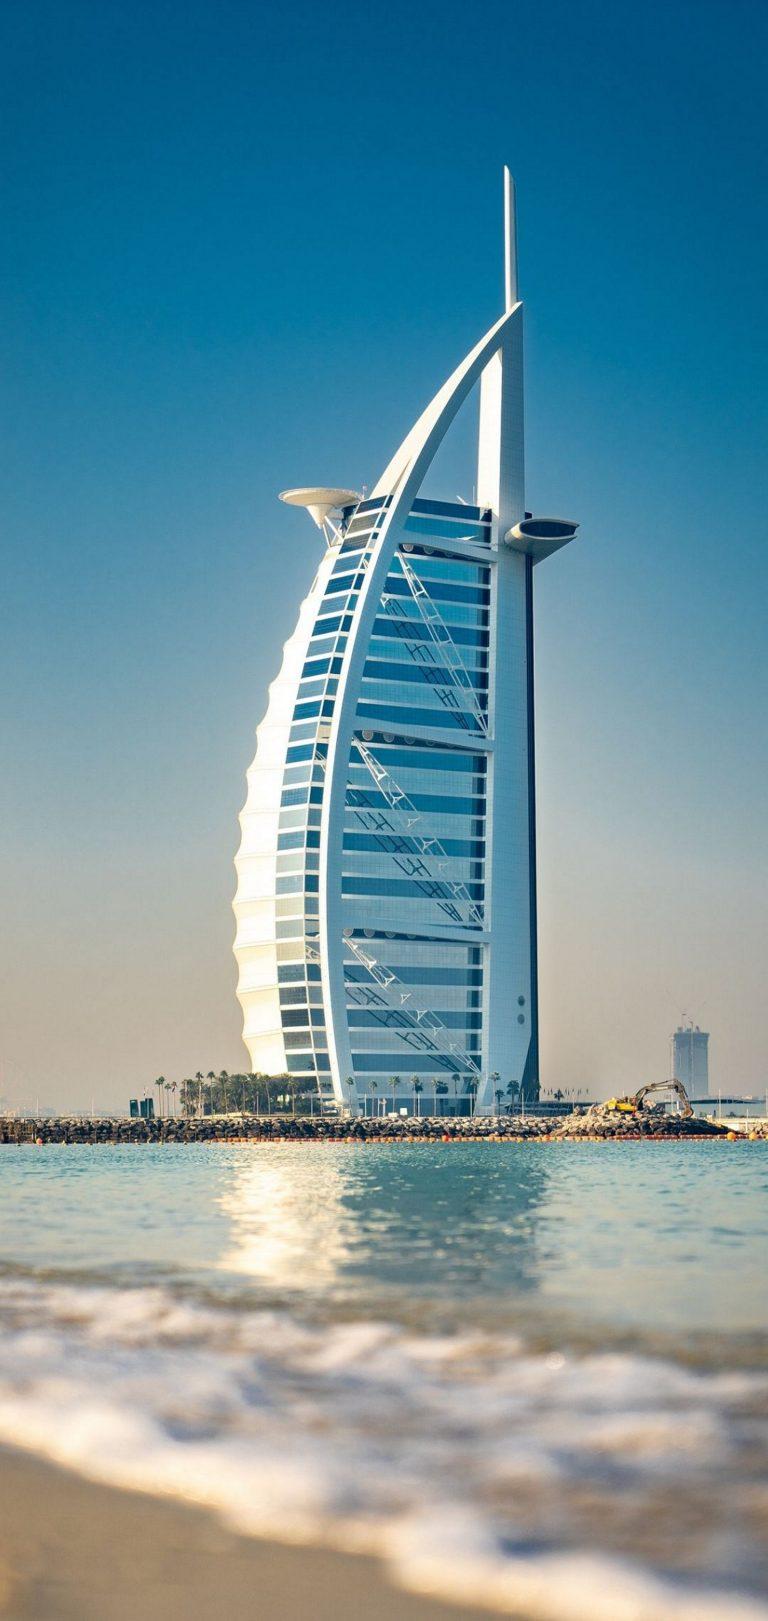 Architecture Building Burj Al Arab Wallpaper 1440x3040 768x1621